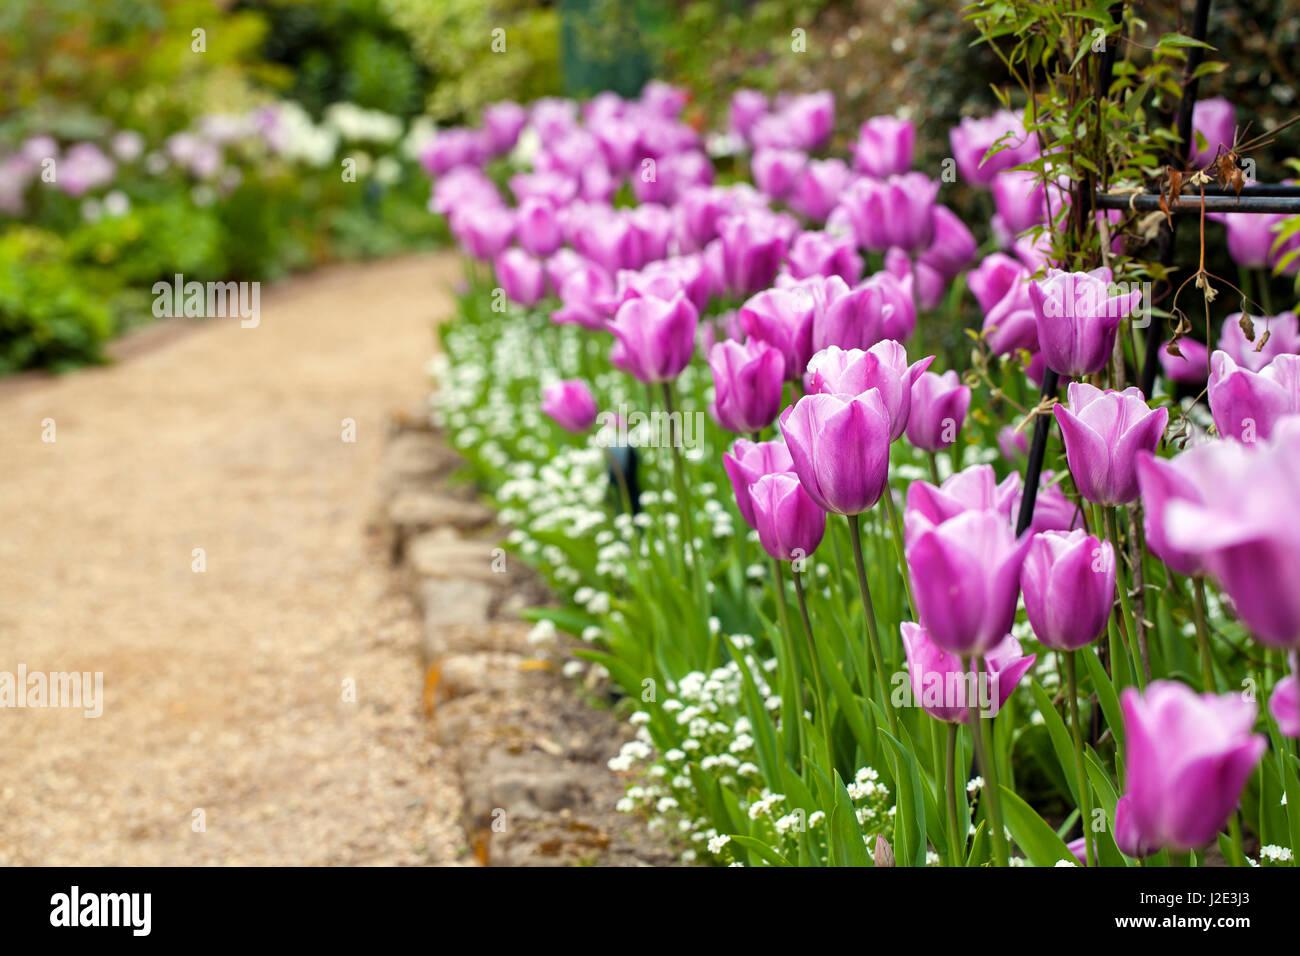 Tulip festival in Pashley Manor, Sussex - Stock Image